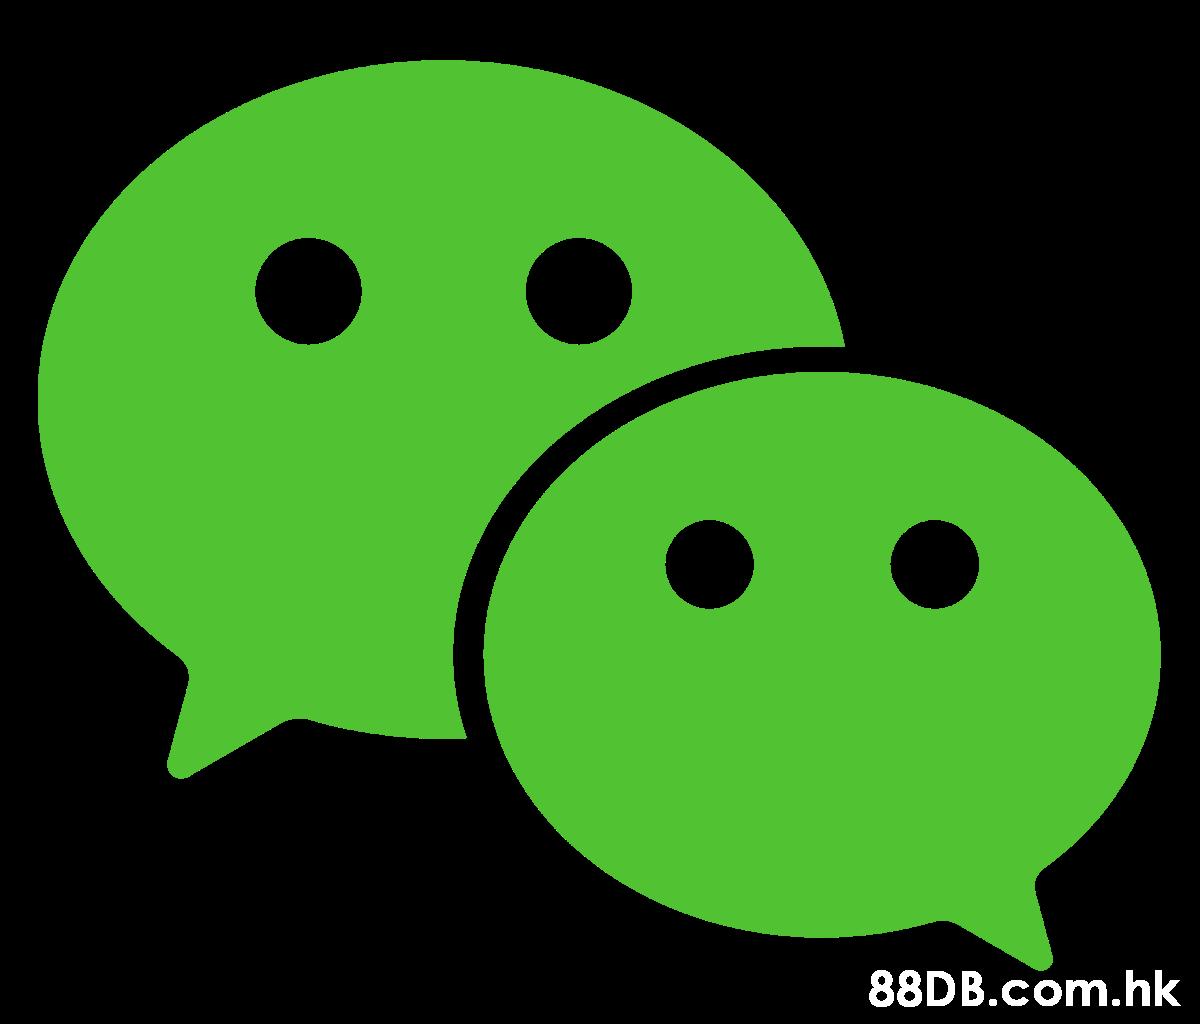 Green,Clip art,